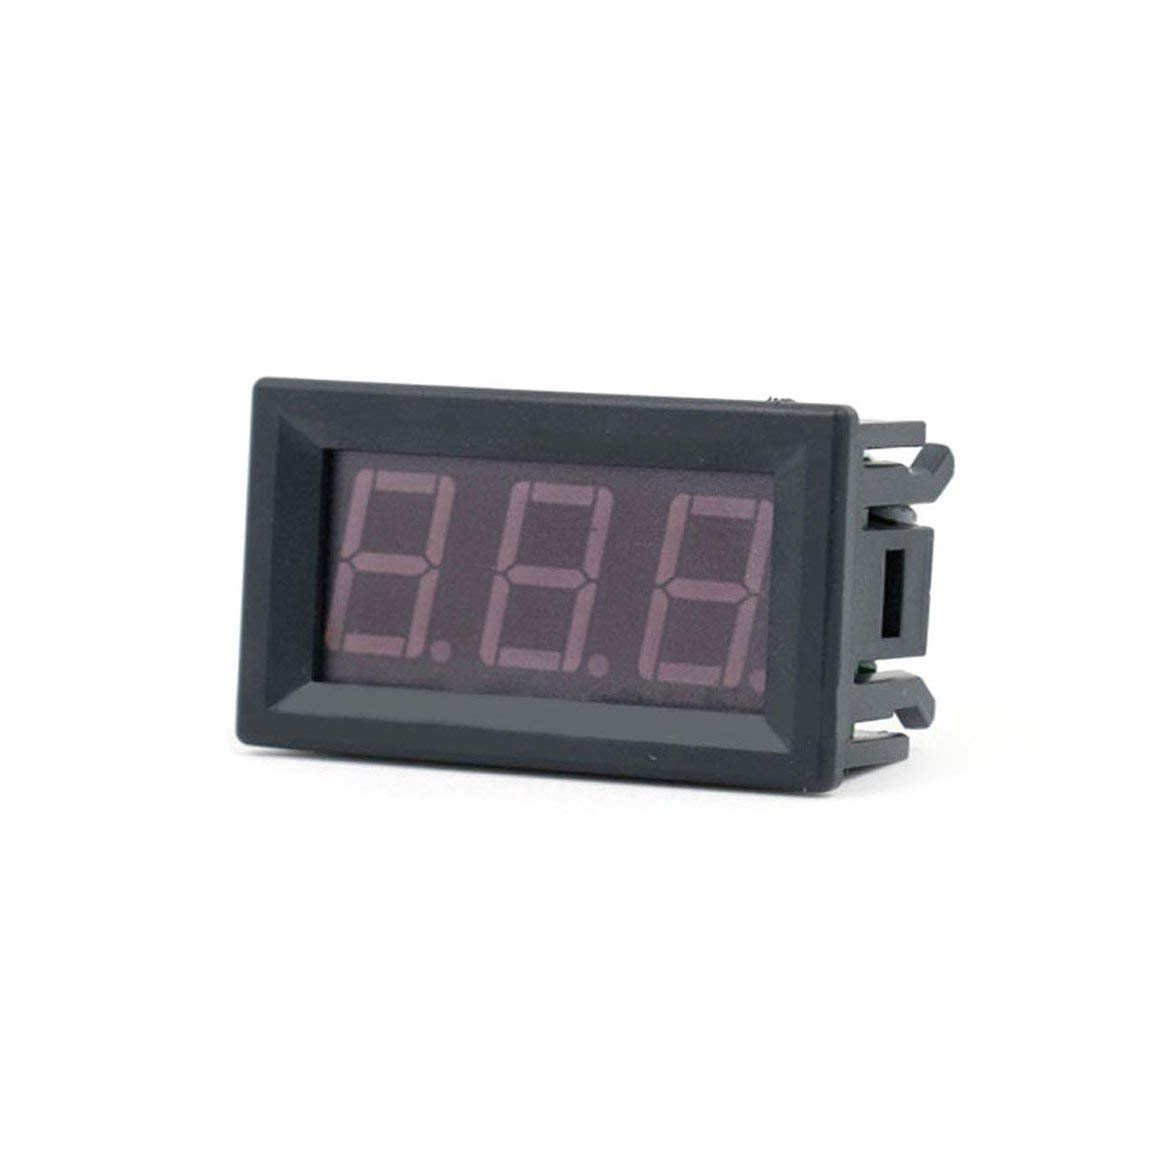 Rot yaoyan DC4.5V-30.0V 0.56in 2-Draht-LED Digitalanzeige Voltmeter elektrisch Spannung Meter Volt Tester f/ür Auto-Batterie Auto-Motorrad